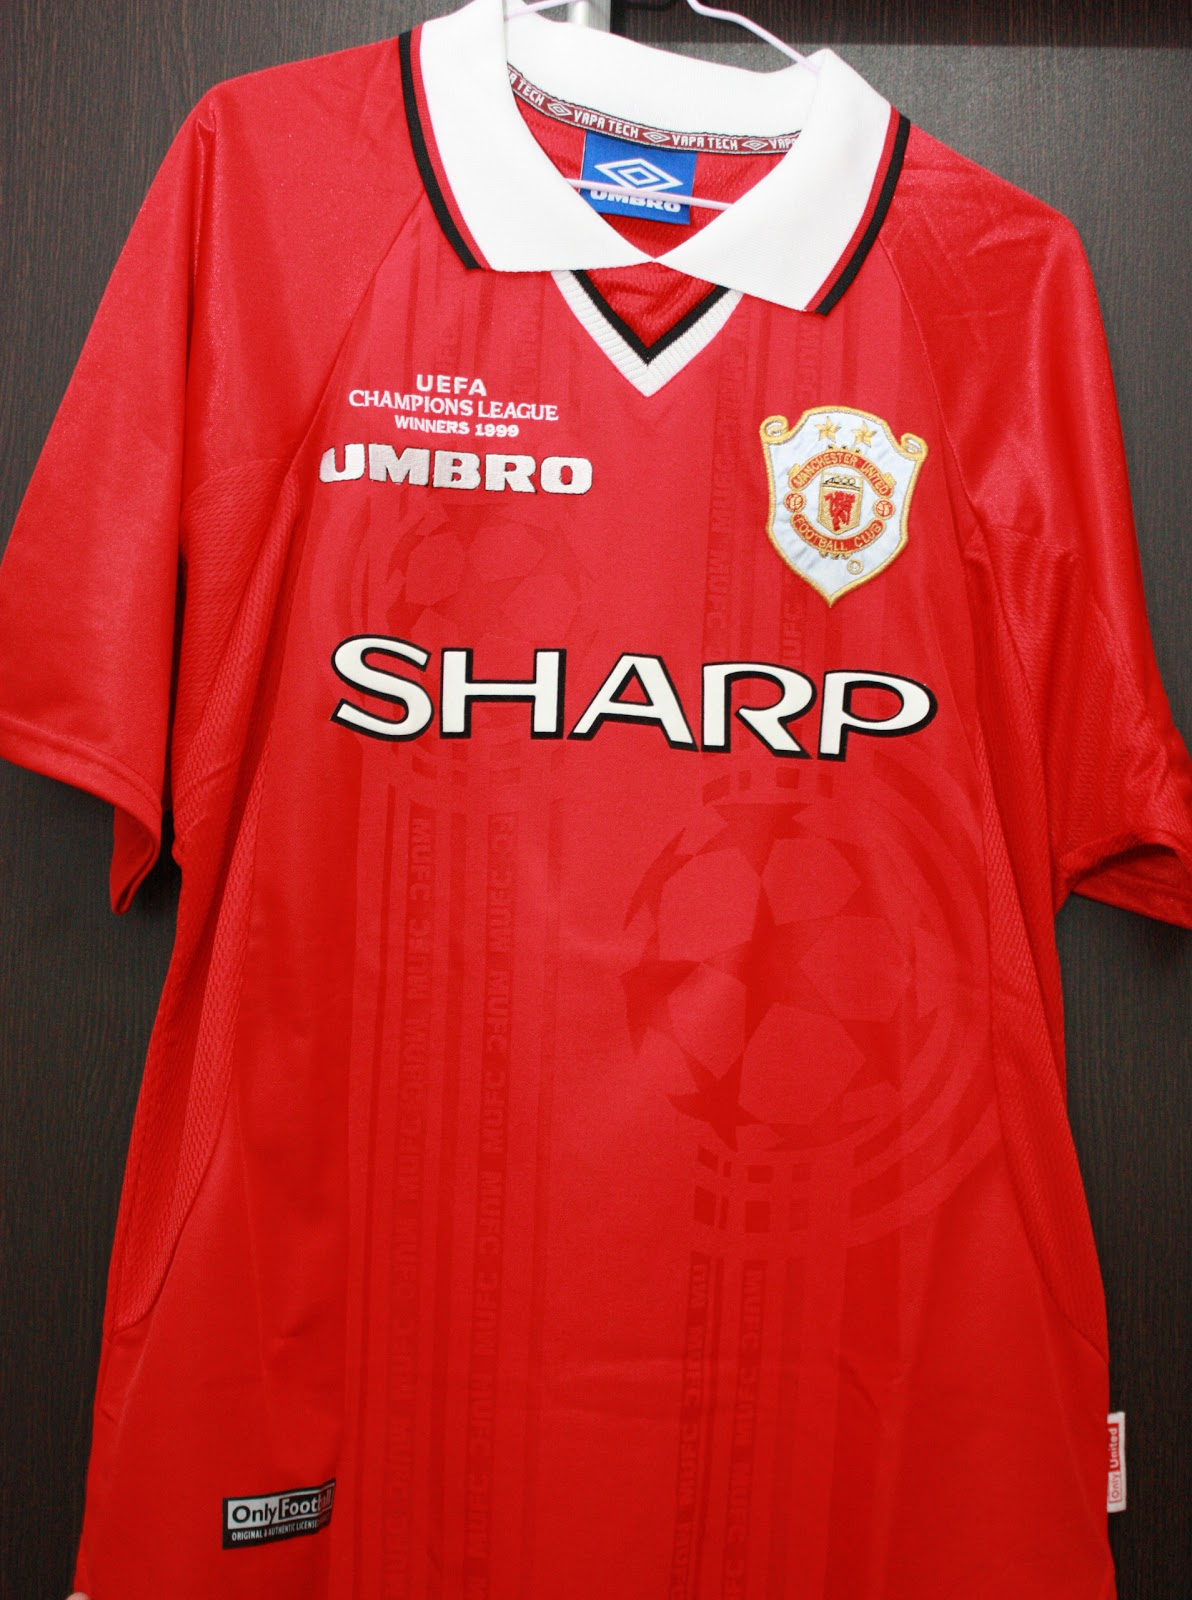 ecf157e7877 Manchester United 1999 Champions League Winners Jersey